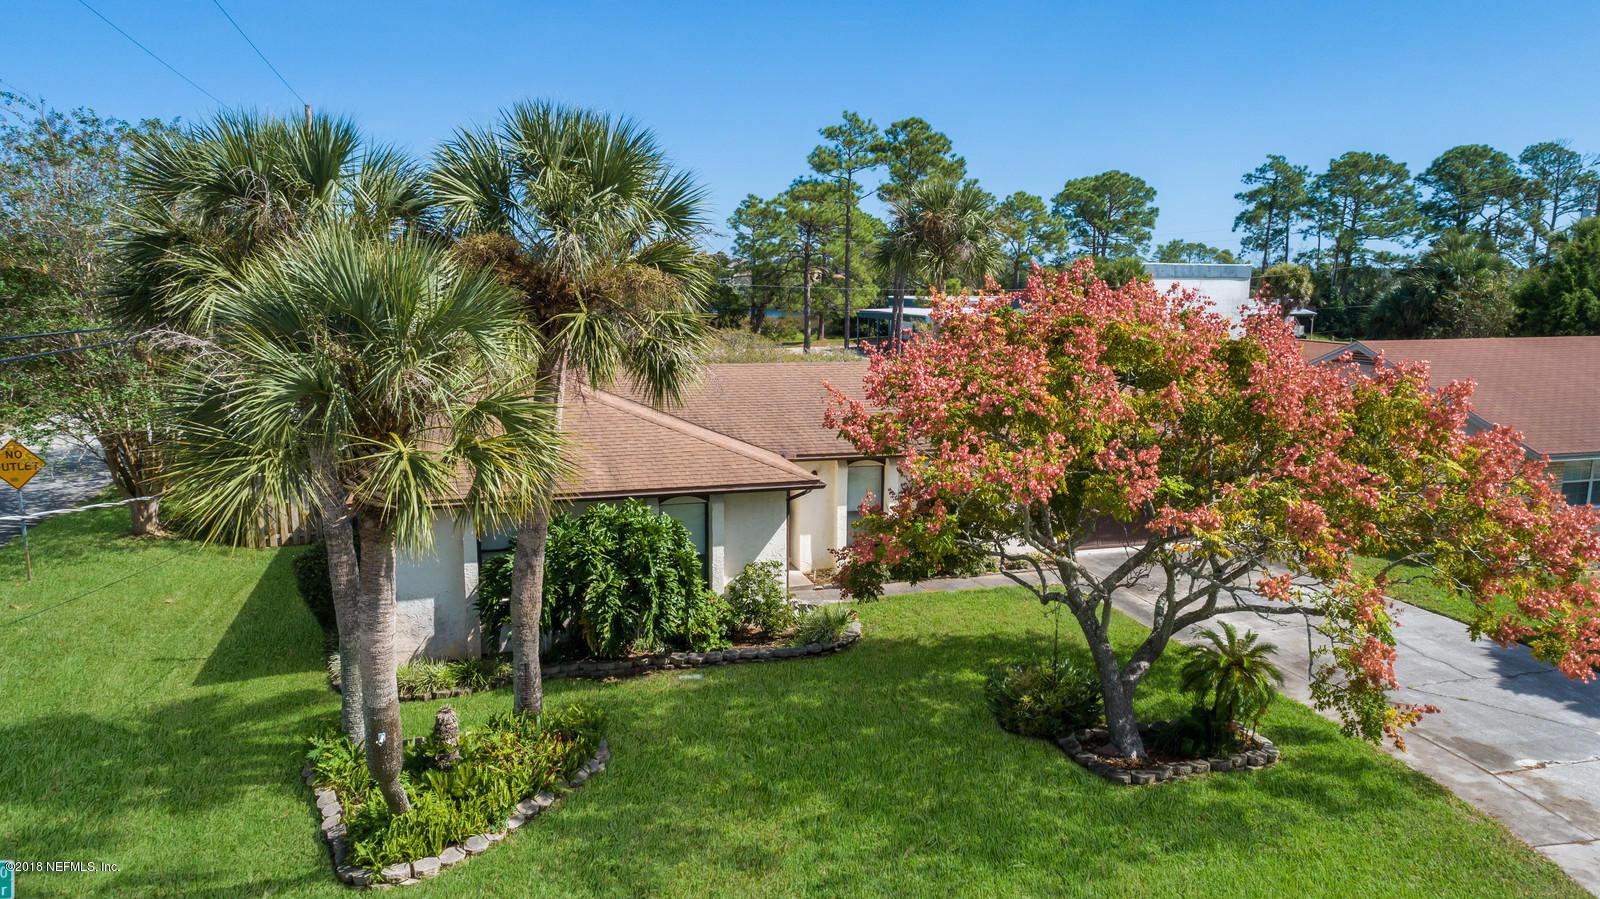 4105 SEABREEZE, JACKSONVILLE, FLORIDA 32250, 3 Bedrooms Bedrooms, ,2 BathroomsBathrooms,Residential - single family,For sale,SEABREEZE,963150